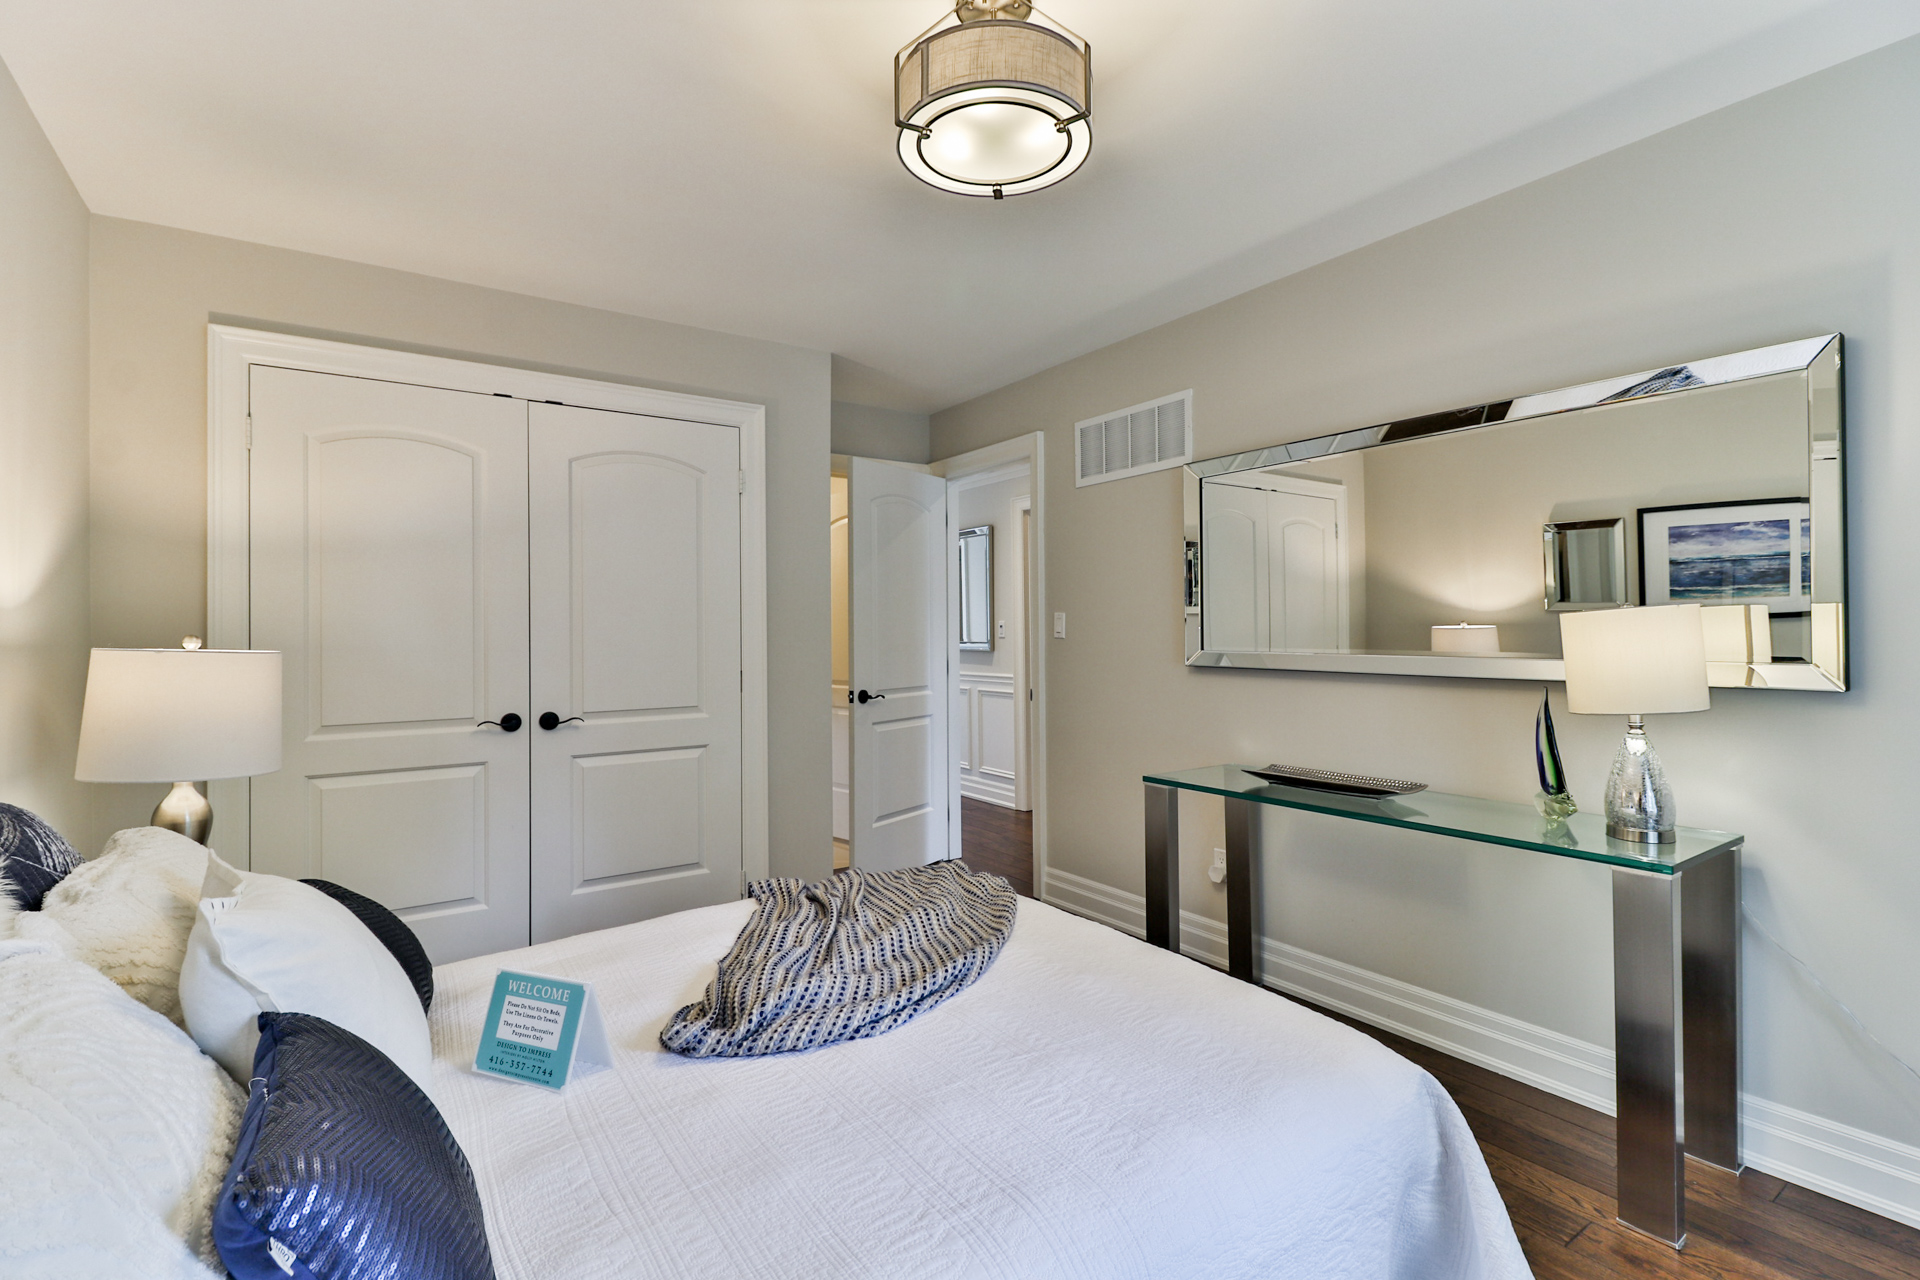 Second Bedroom Walkway, 149 Shaver, Etobicoke Home Staging